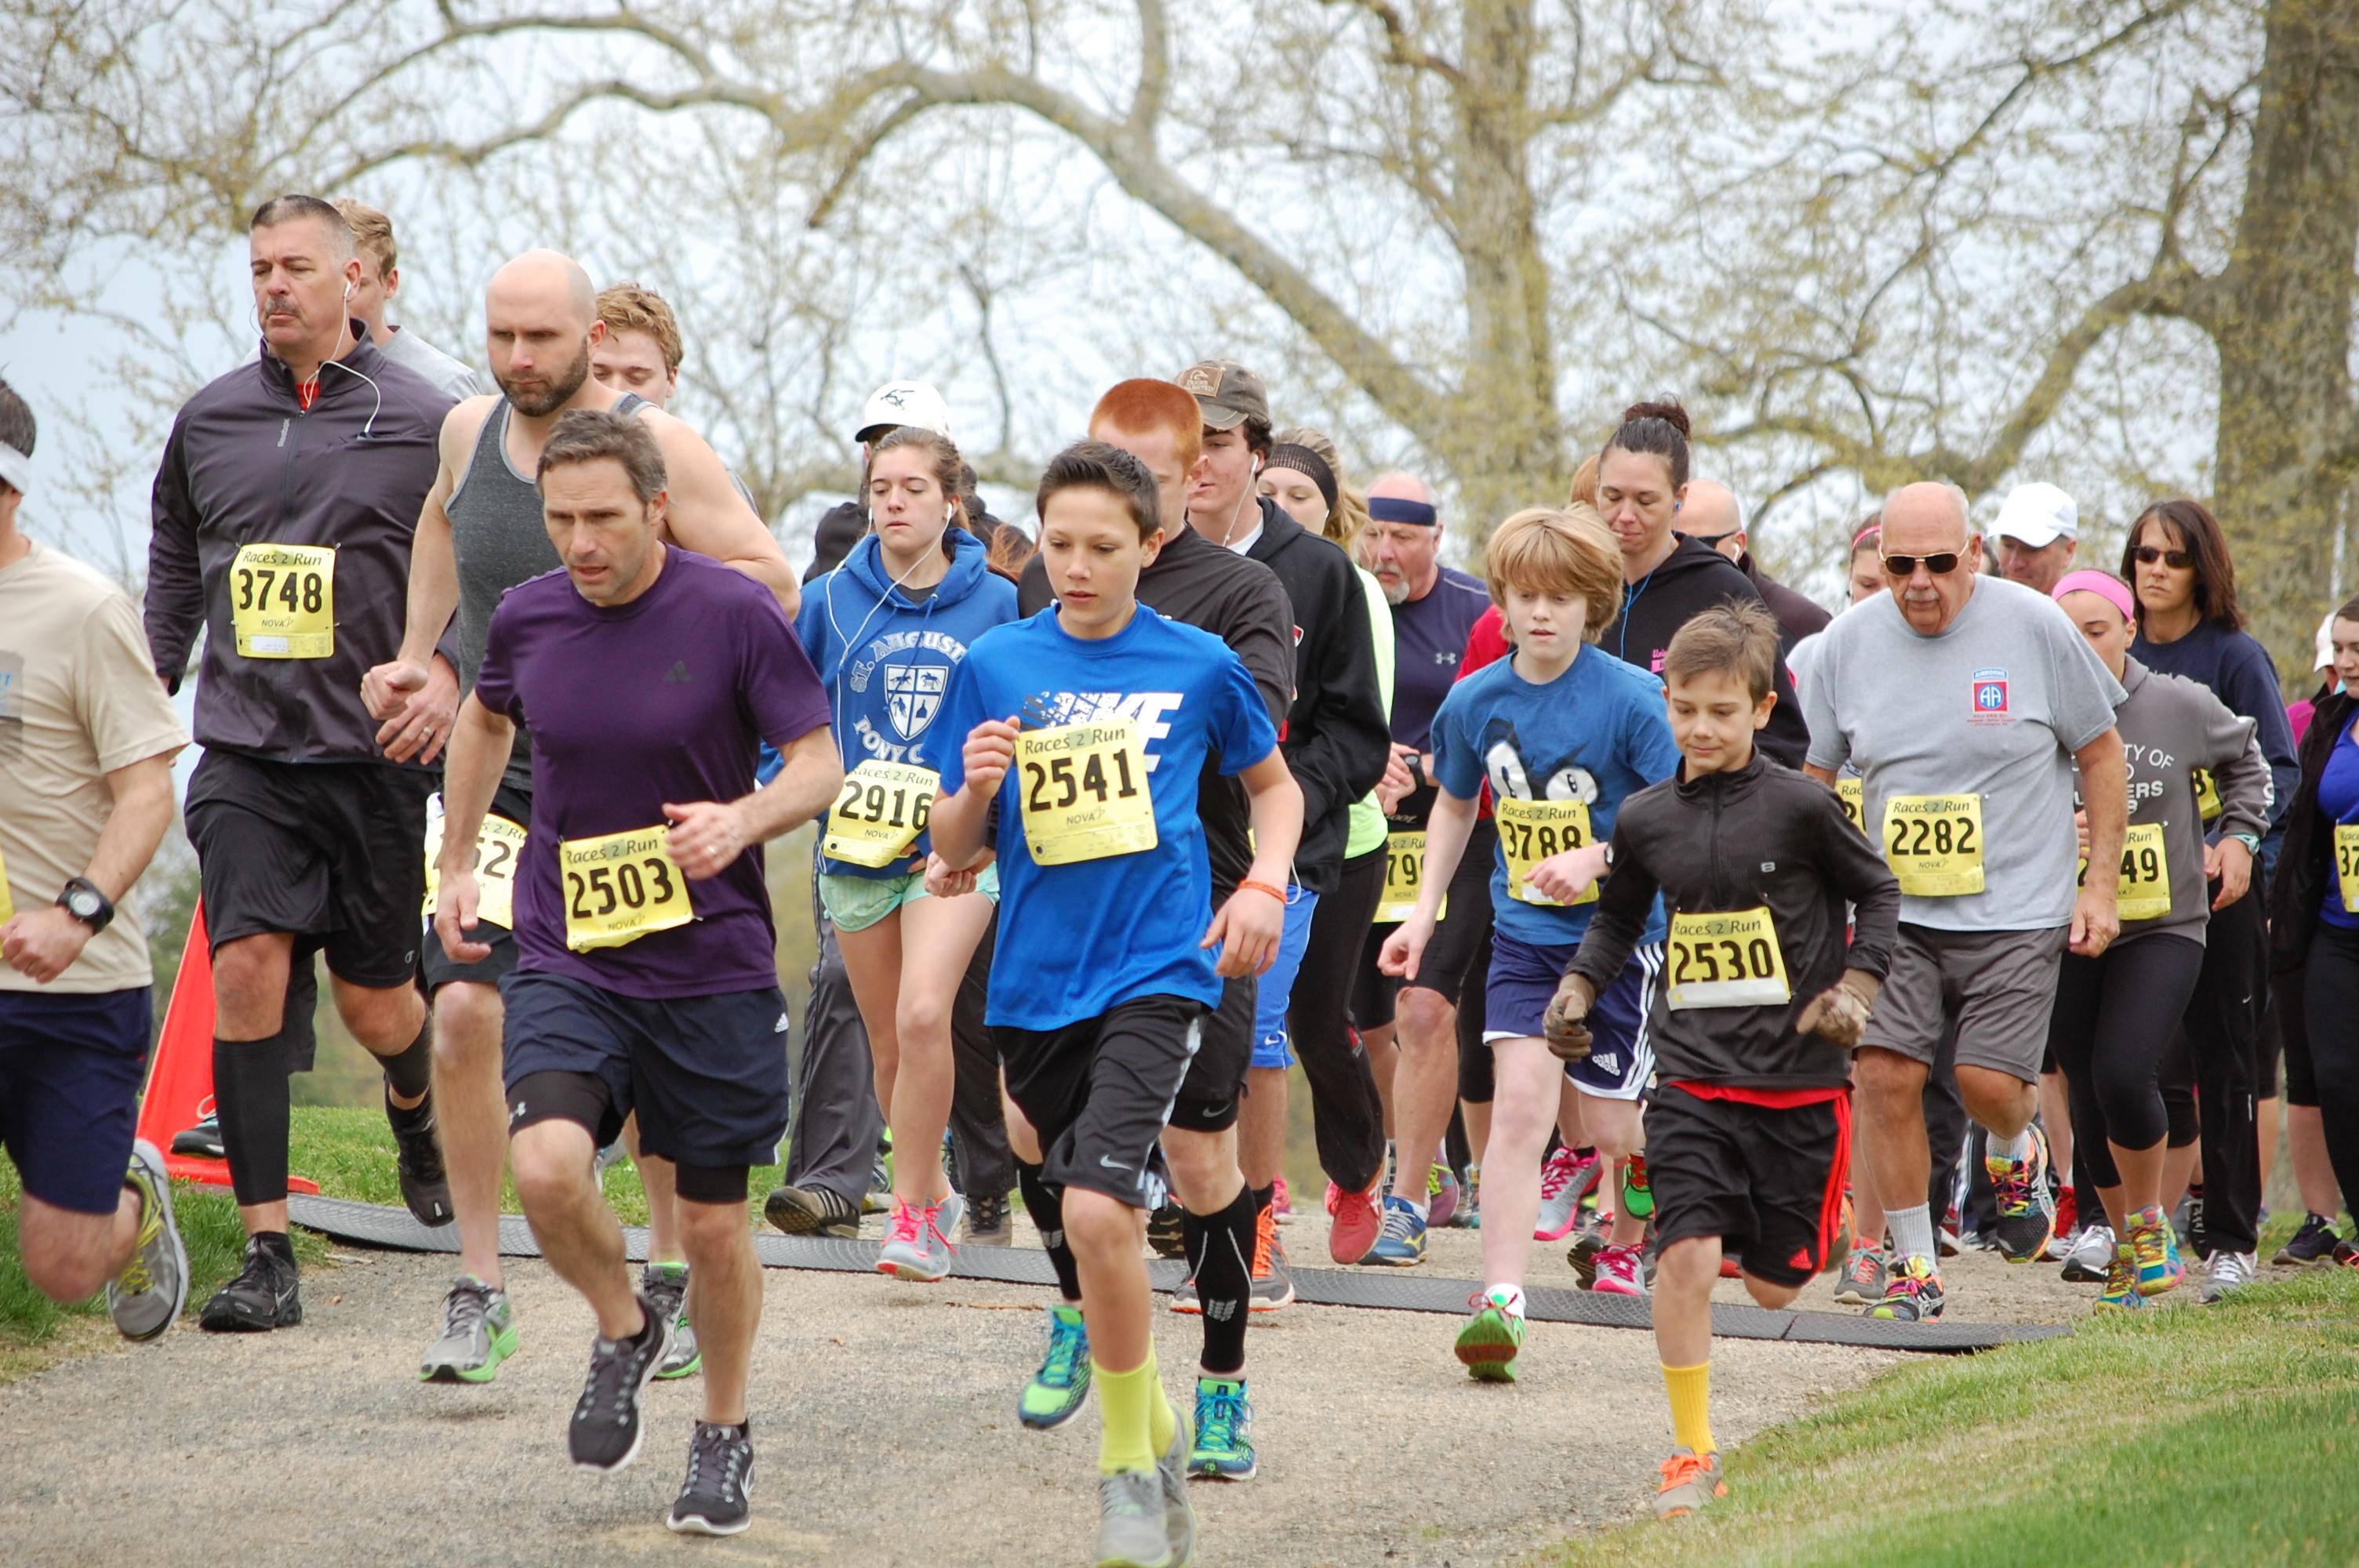 Mount Harmon Earth Day 5K Run/Walk